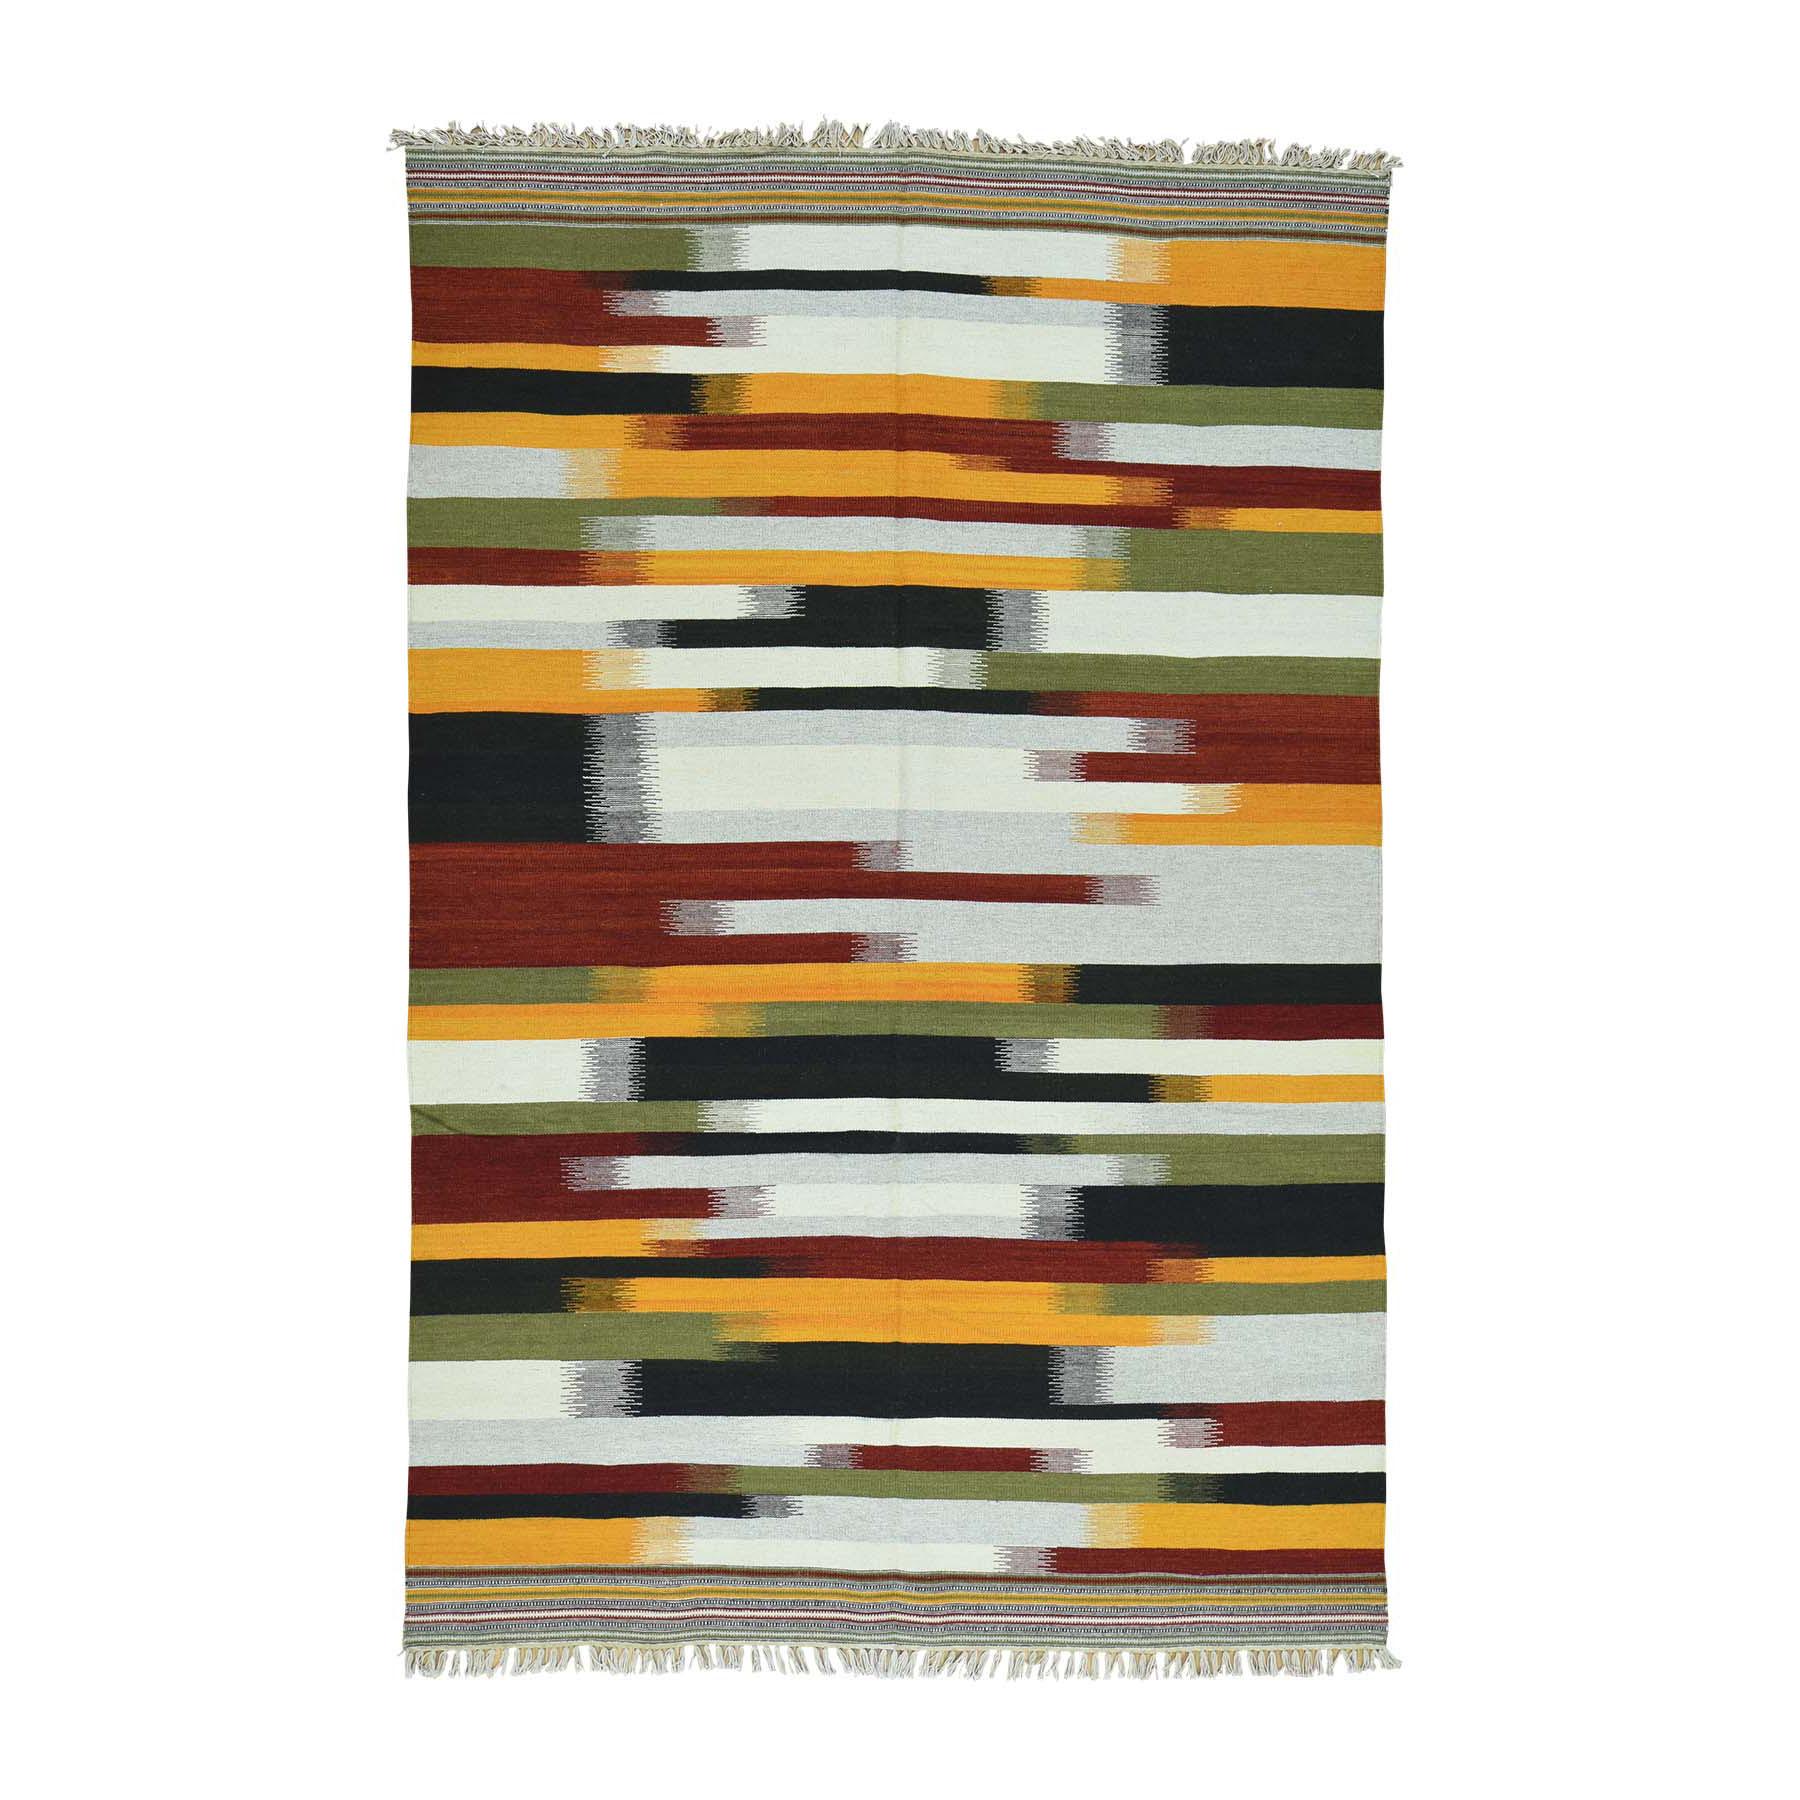 "6'X9'3"" Hand-Woven Pure Wool Dazzling Durie Kilim Flat Weave Carpet moaca8ba"